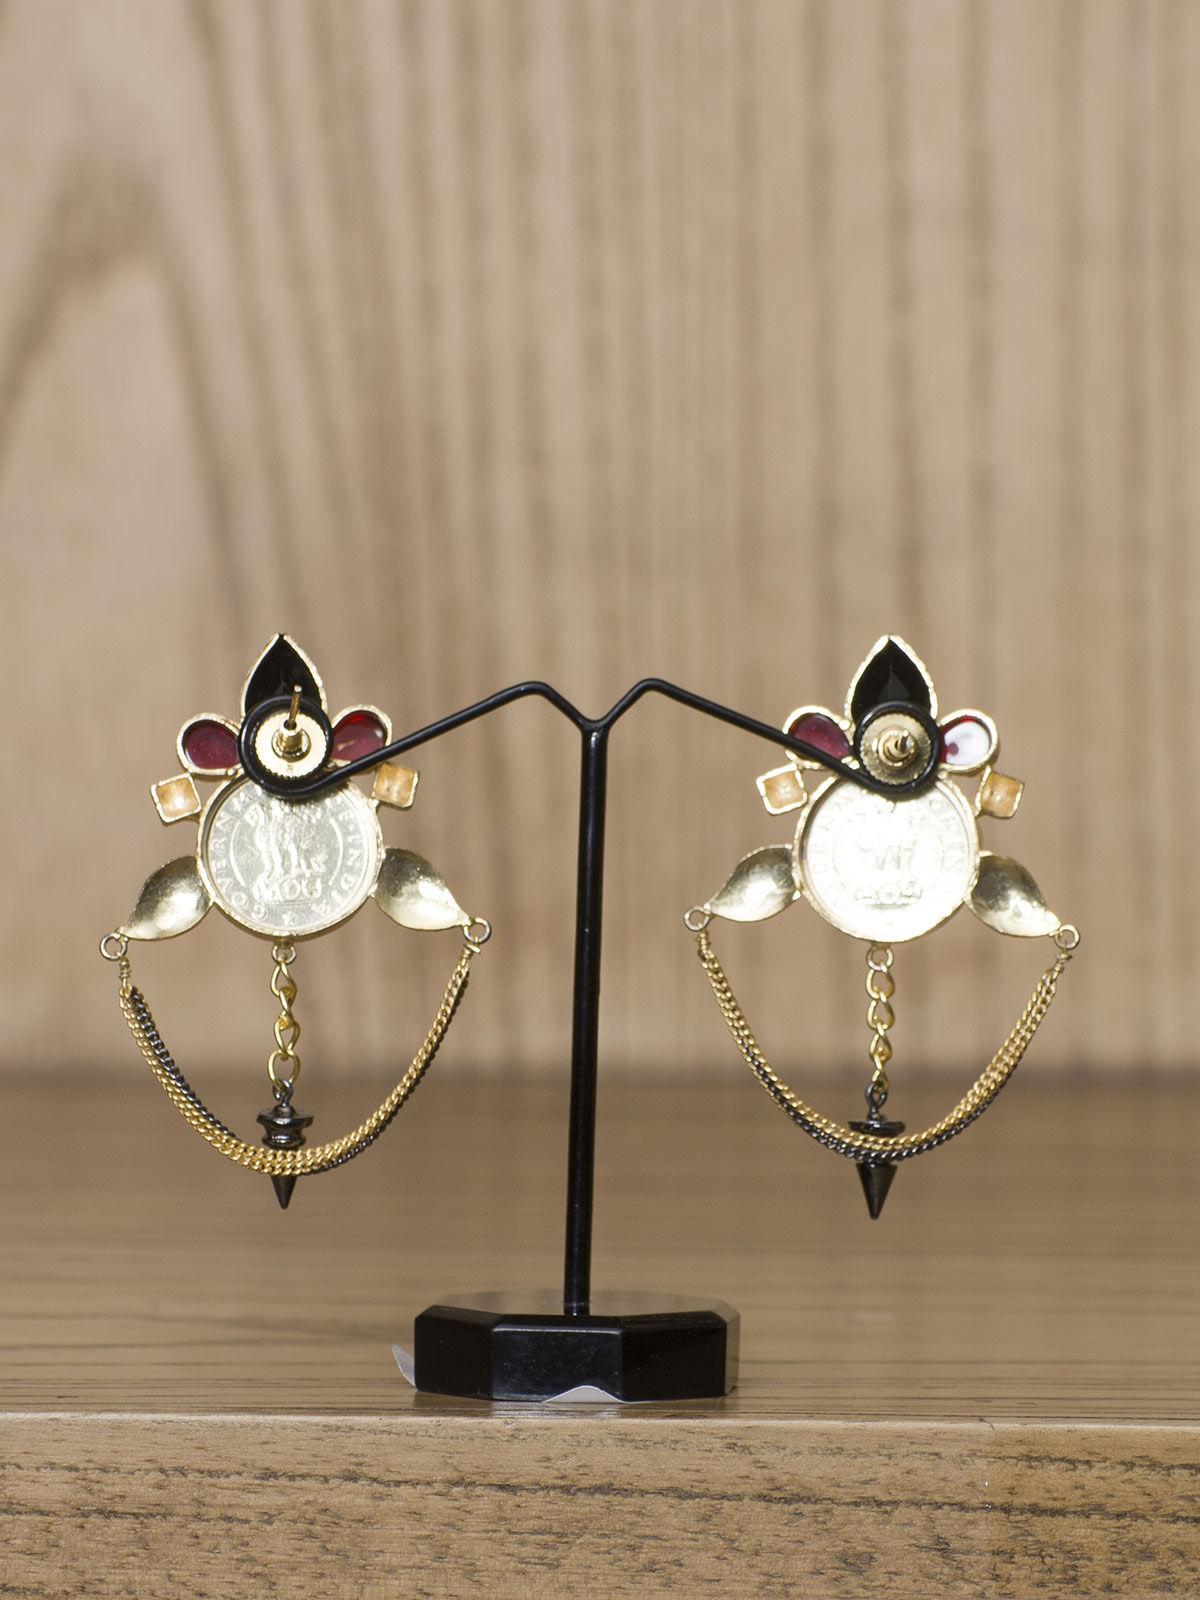 Indian August star shaped semi-precious metal earrings